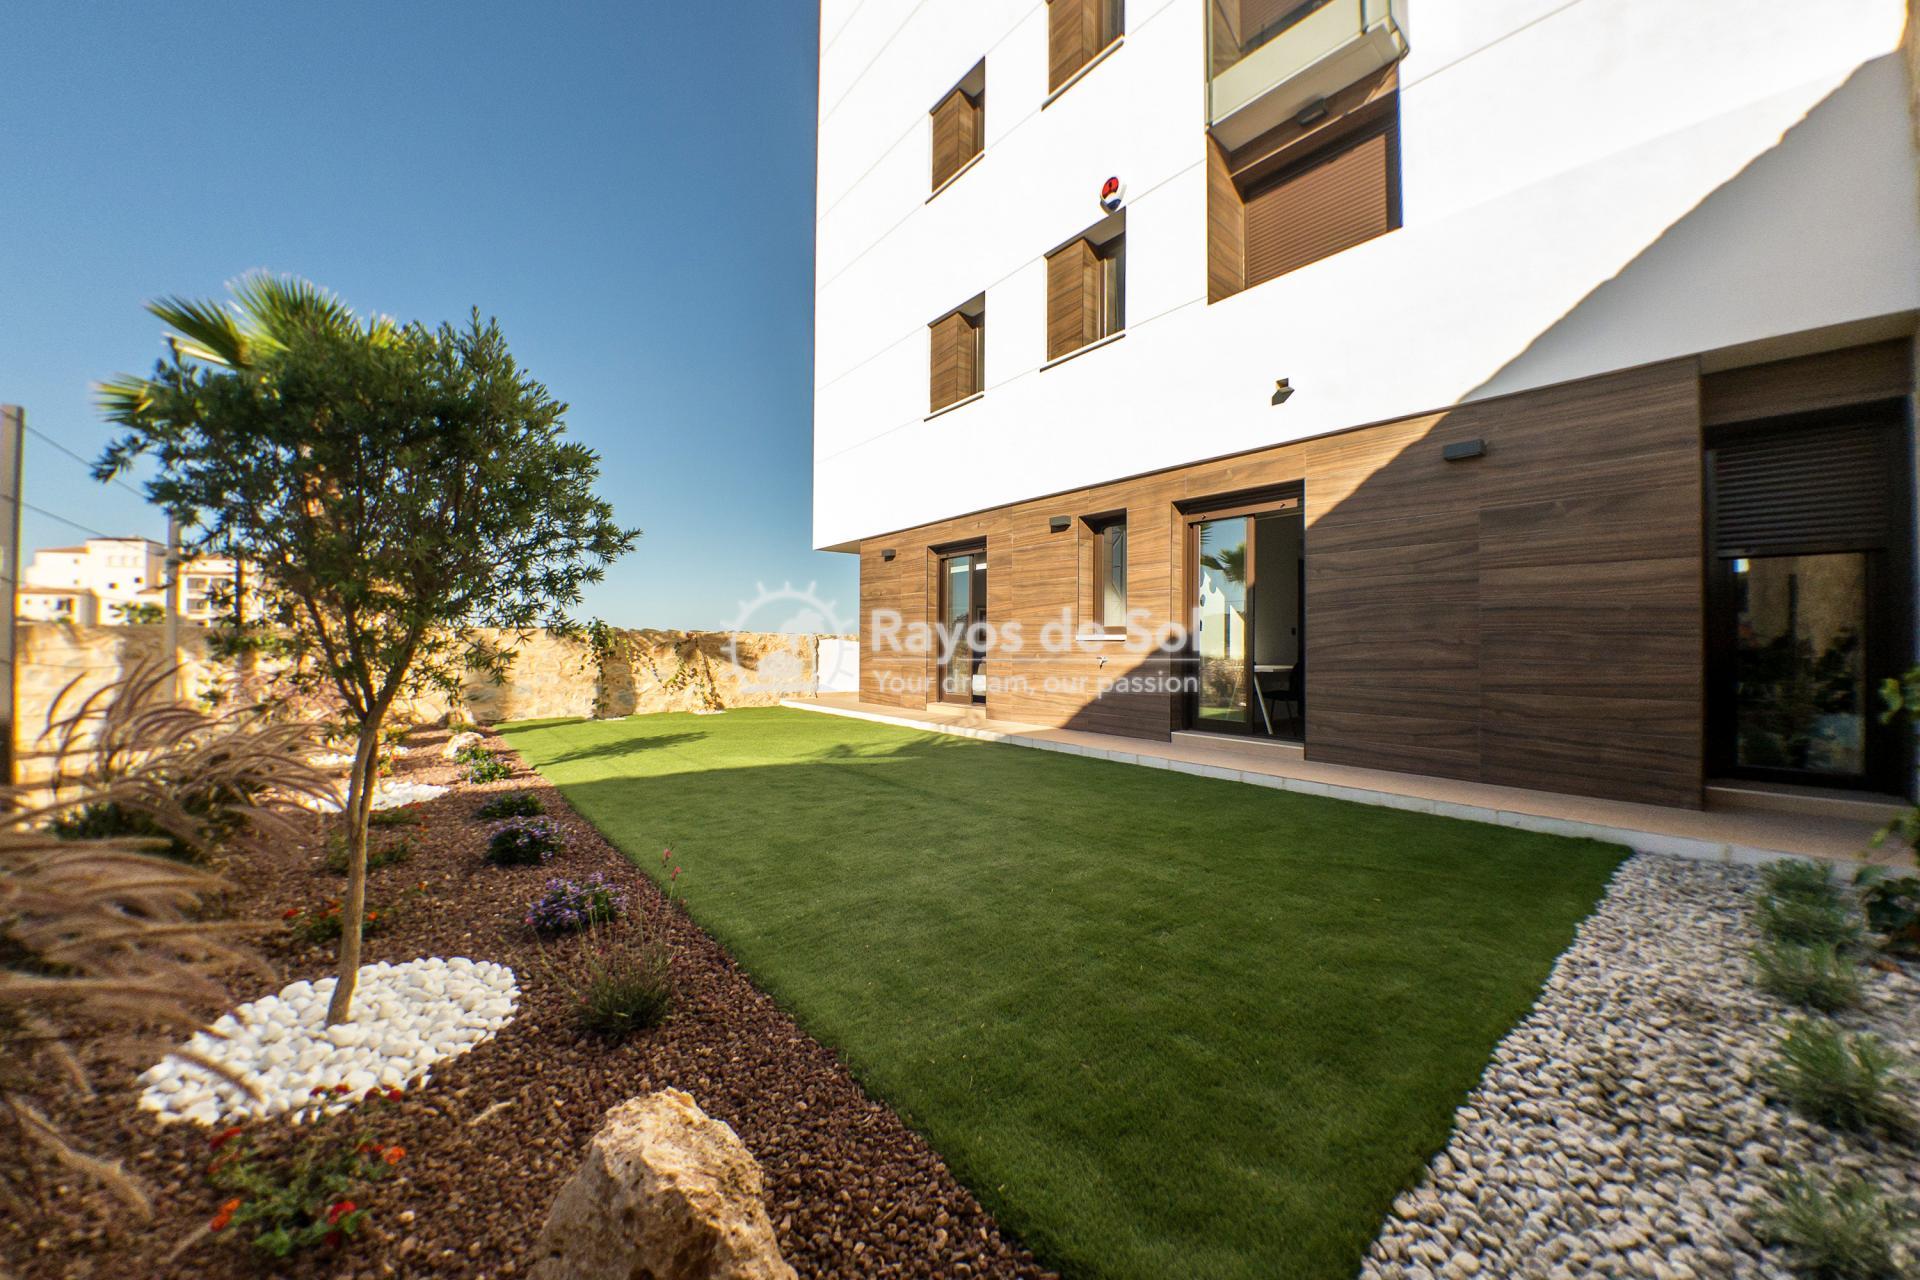 Golf apartment ground floor in Las Ramblas, Villamartin, Costa Blanca (VIPALO3-2B) - 26